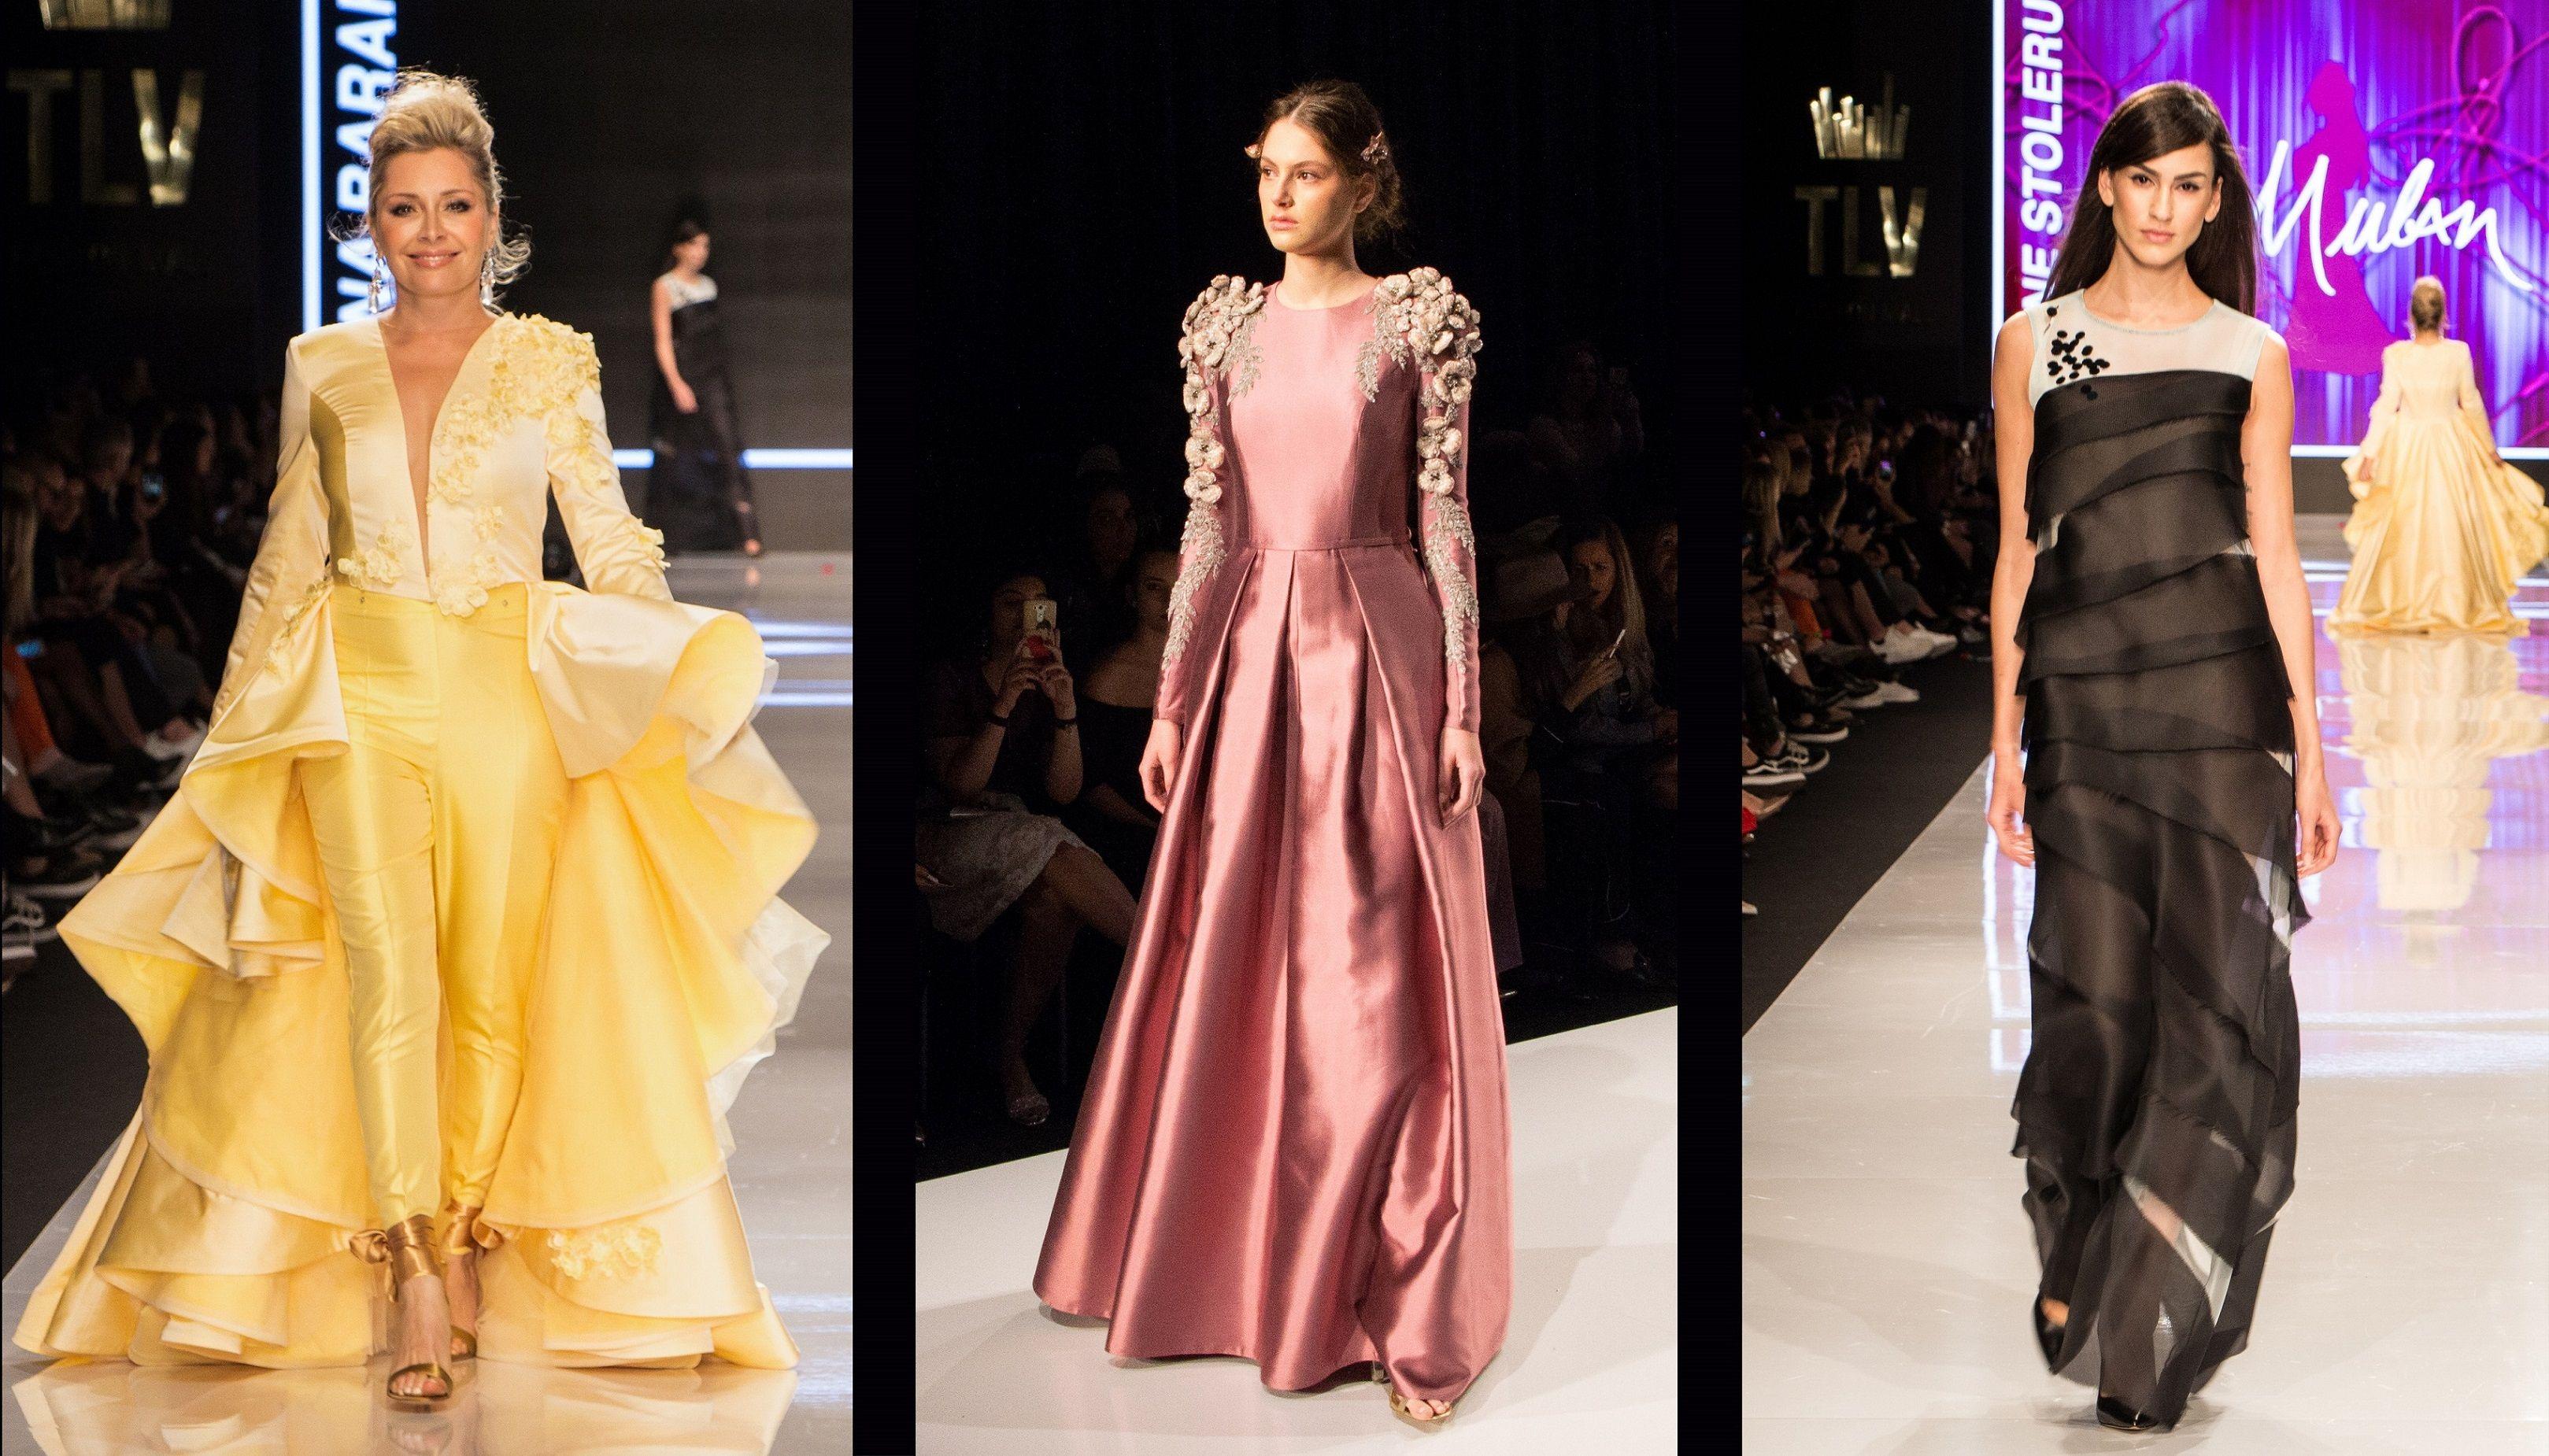 Tel Aviv Fashion Week: Where Disney Princesses meet 'Haredi Chic'